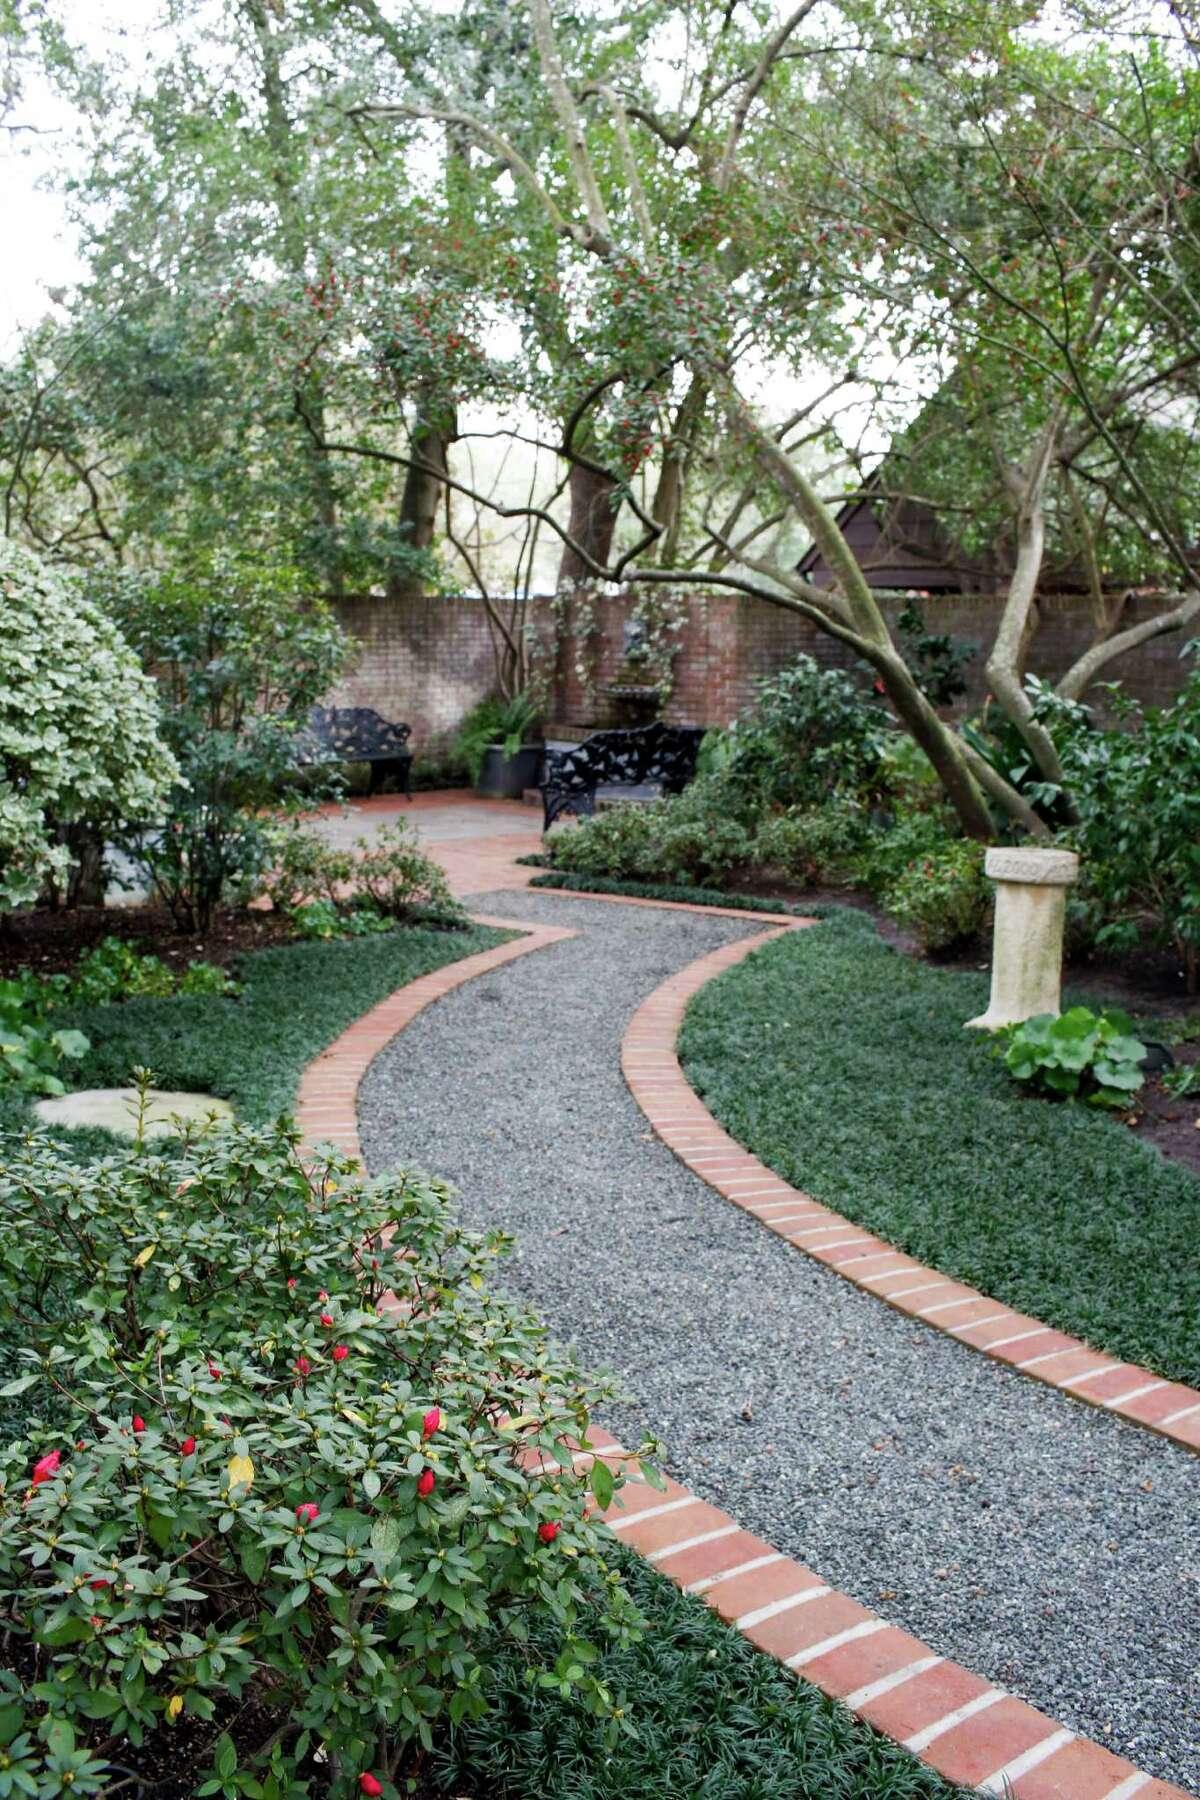 Varying green textures, camellias and azaleas line a garden path at a River Oaks home on the Azalea Trail.